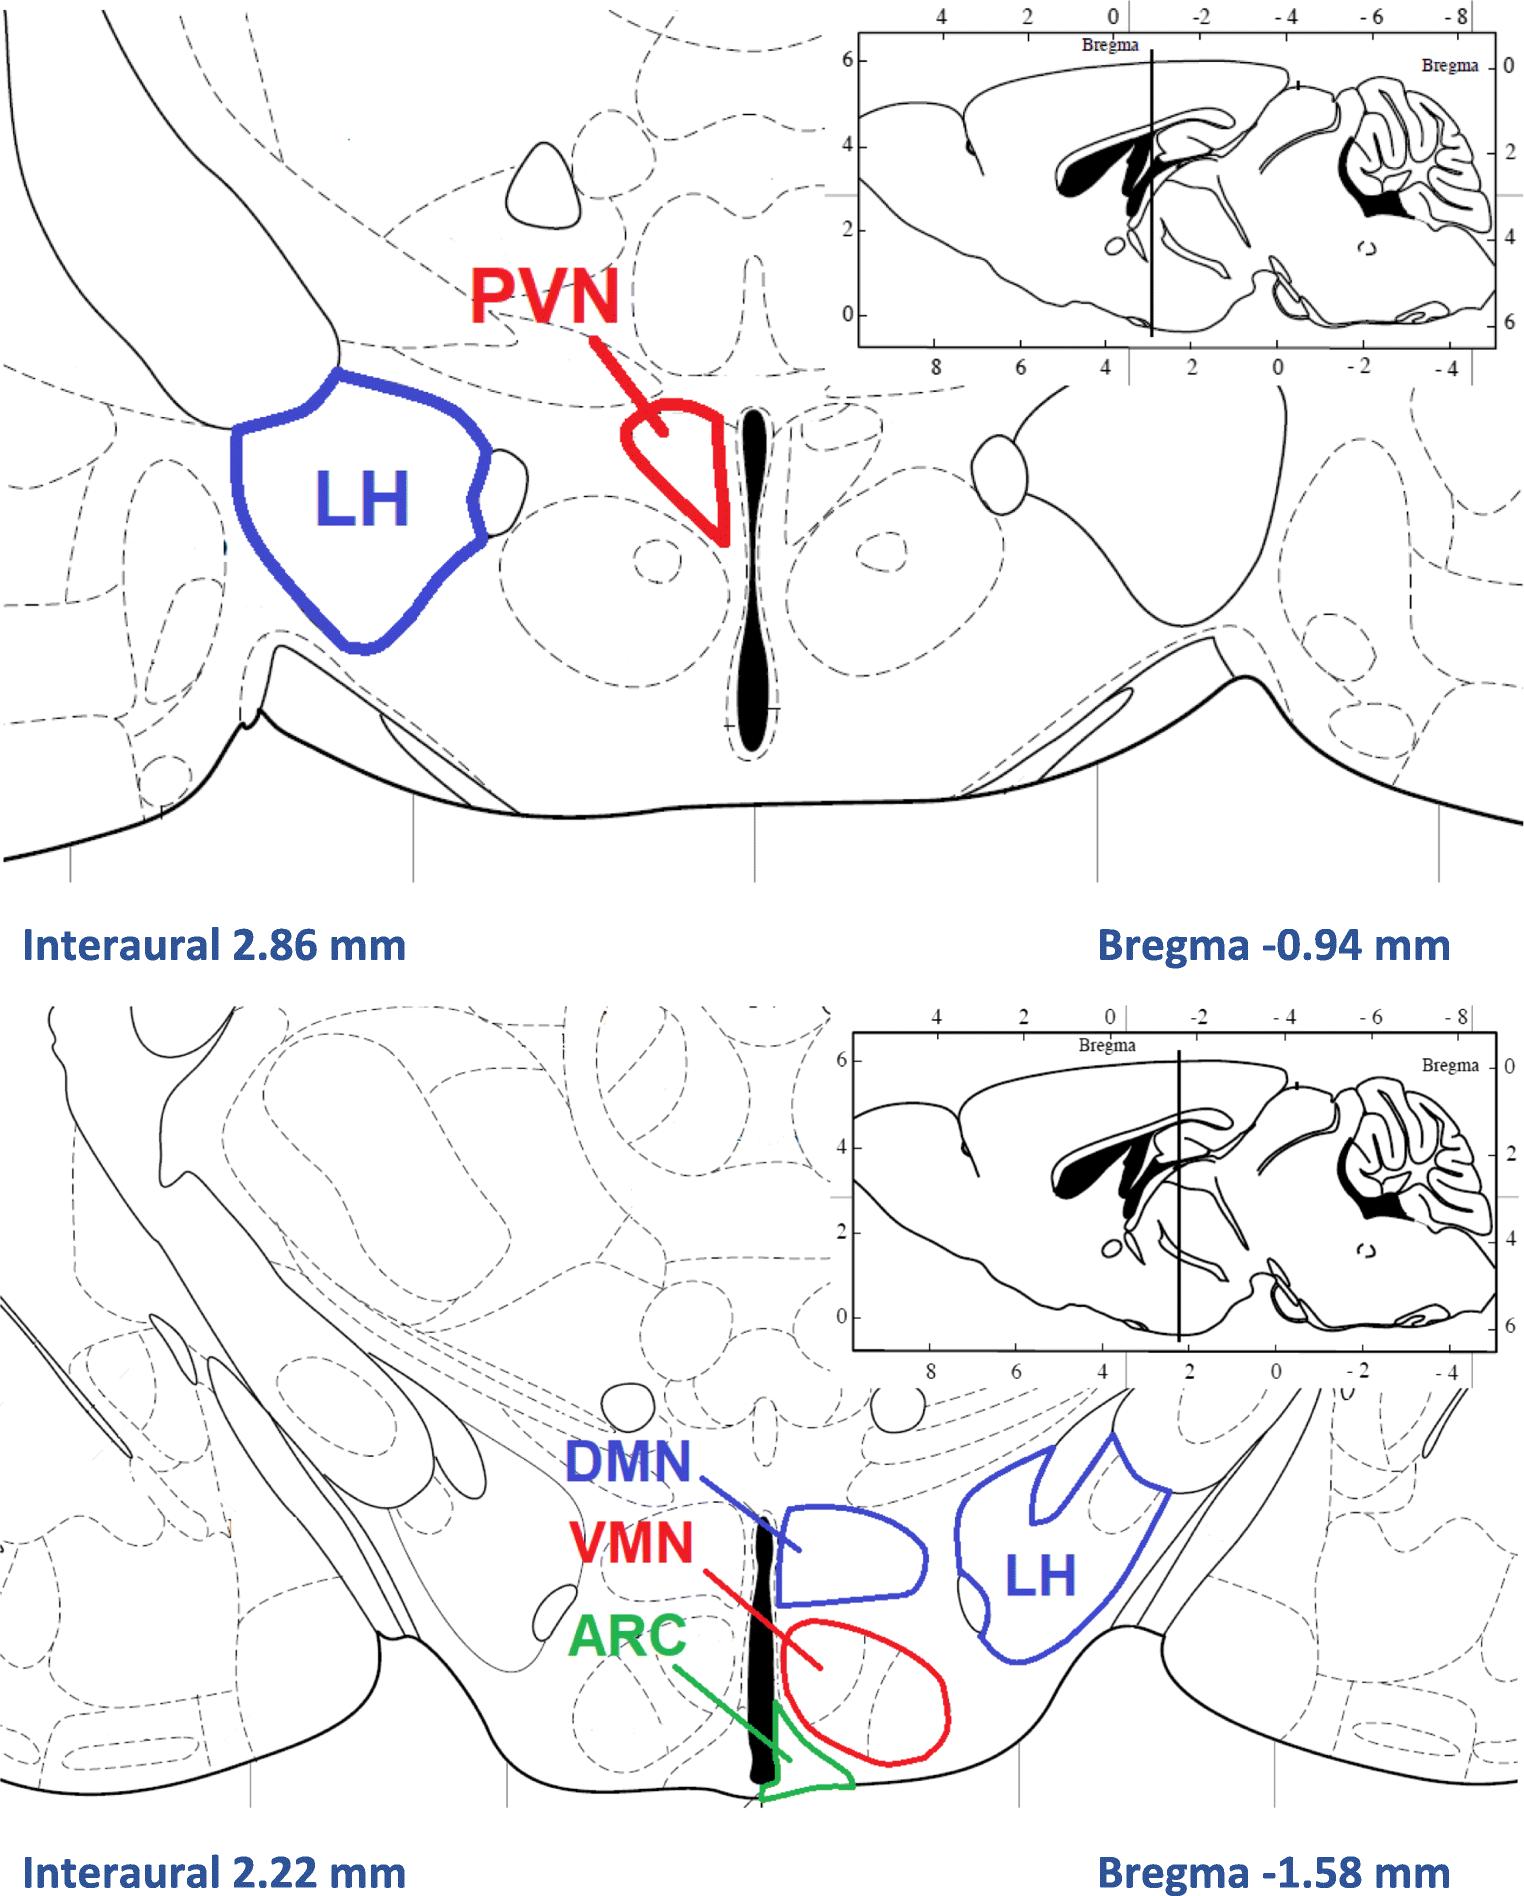 Brain Glucose Sensing Mechanism And Energy Homeostasis Springerlink Robbins Amp Myers Wiring Diagram Open Image In New Window